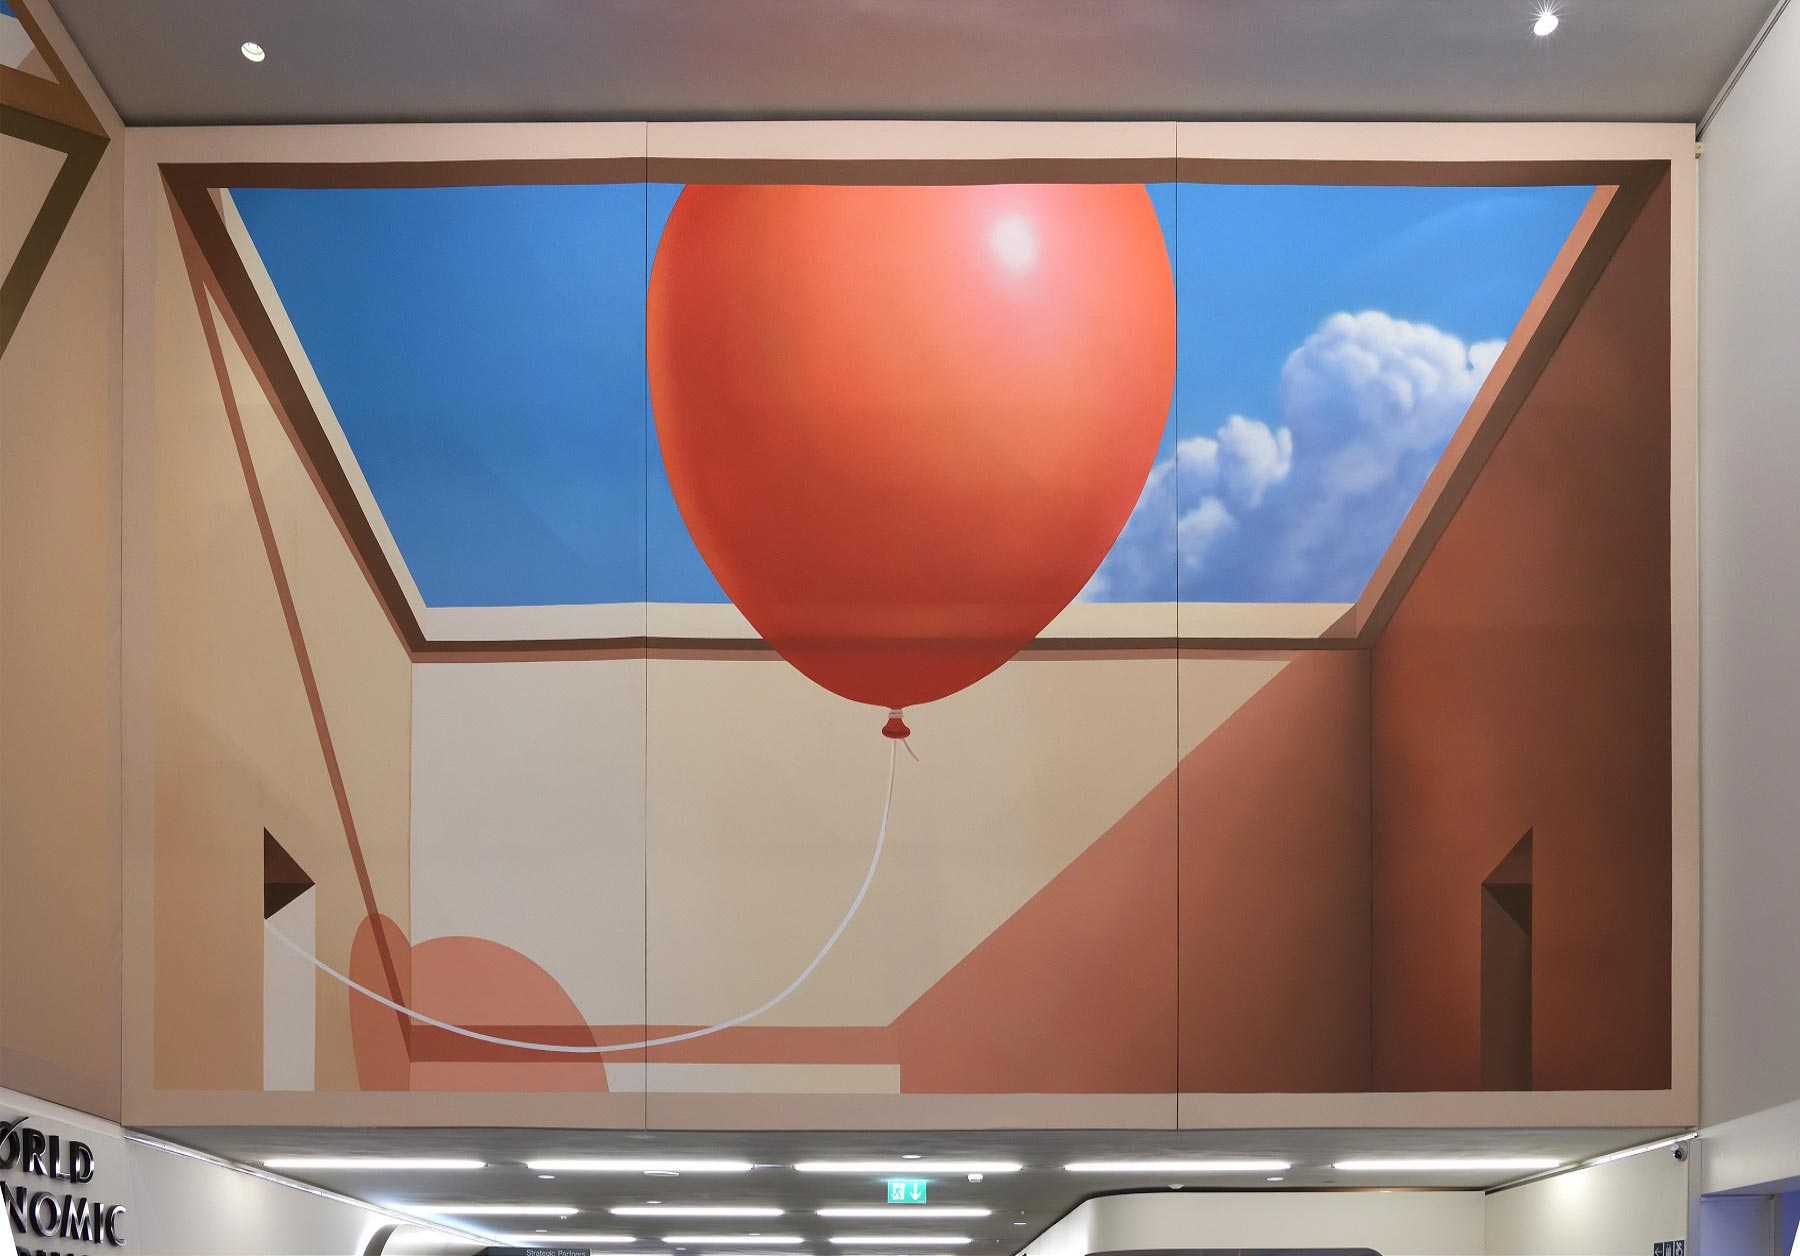 La artista Mehdi Ghadyanloo representa la esperanza con un globo rojo